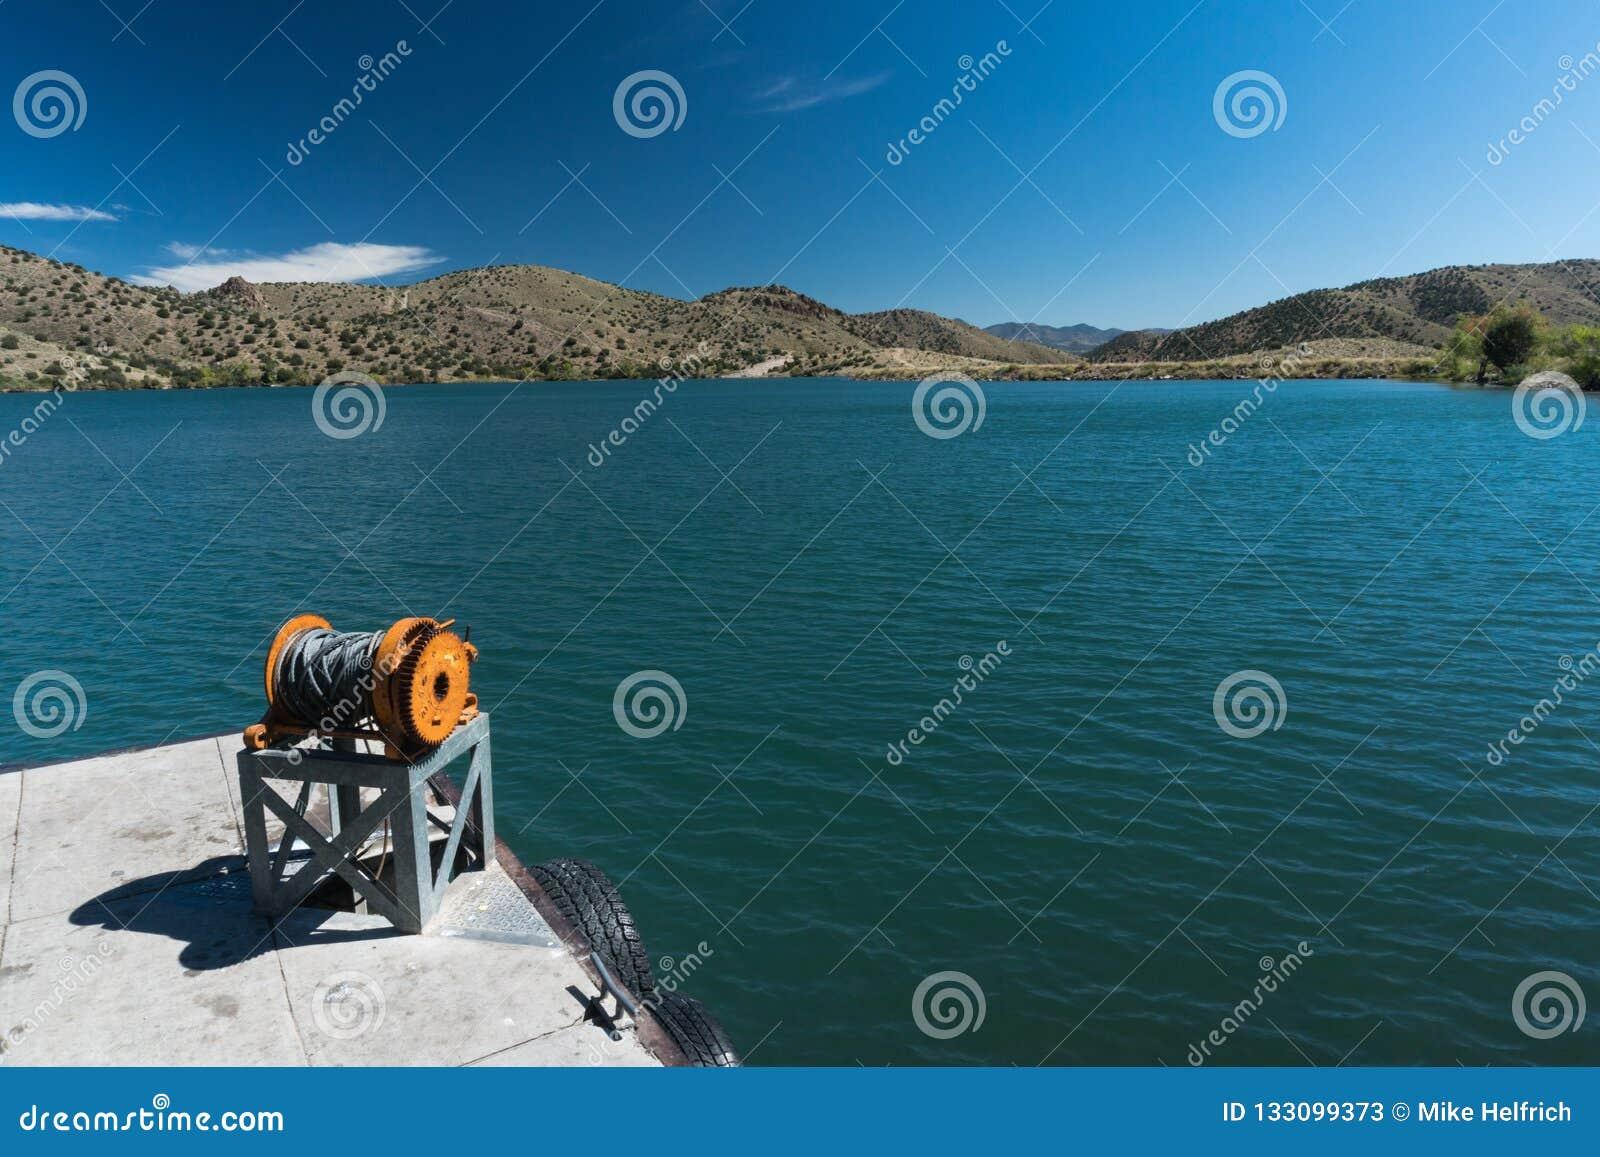 Bill Evans Lake dock near Silver City in New Mexico.